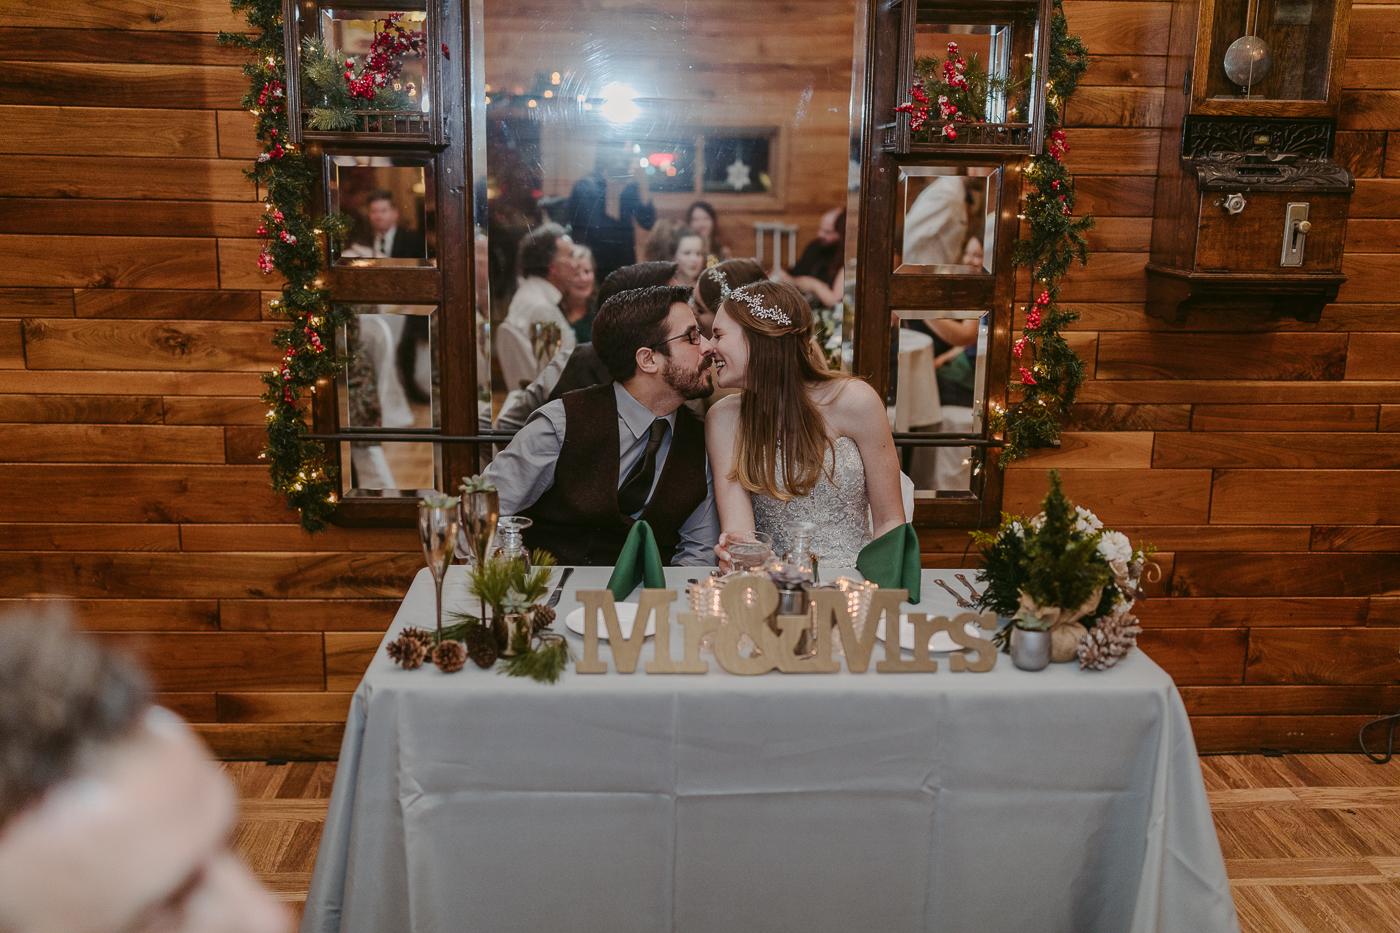 Squires-Castle-Winter-Wedding-43.jpg